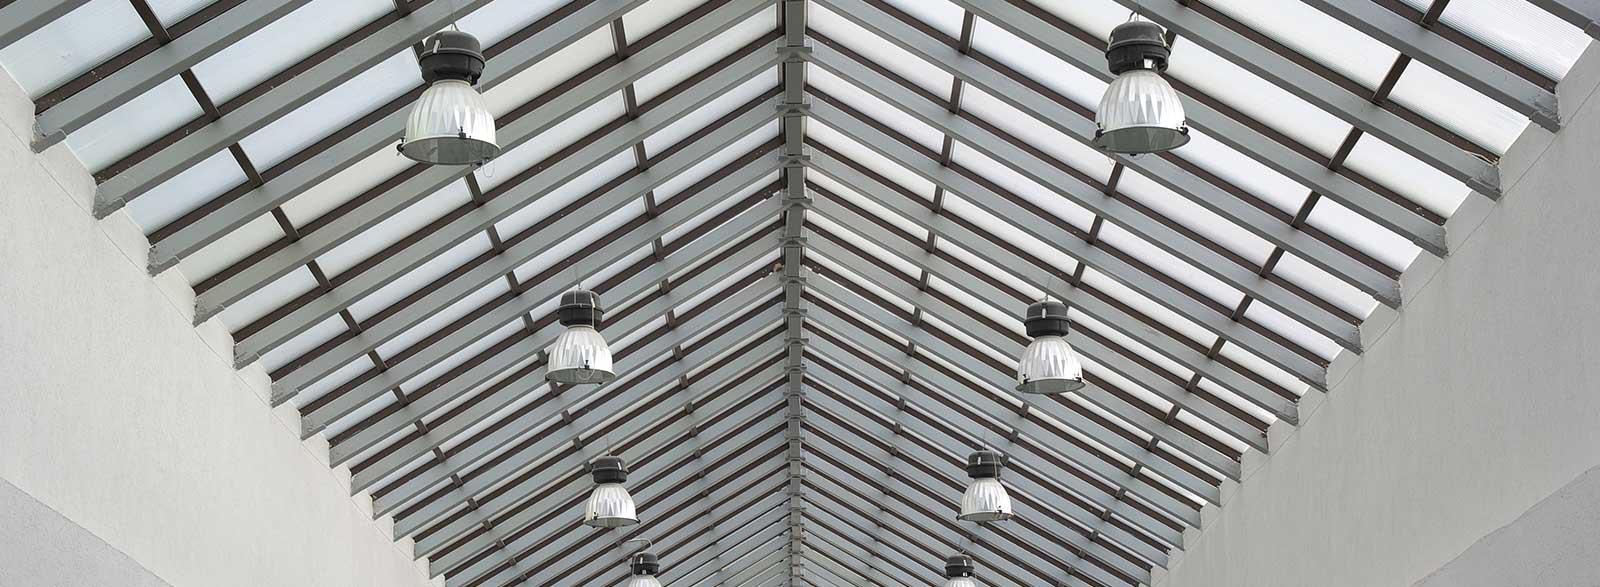 wiegg-lighting-roof